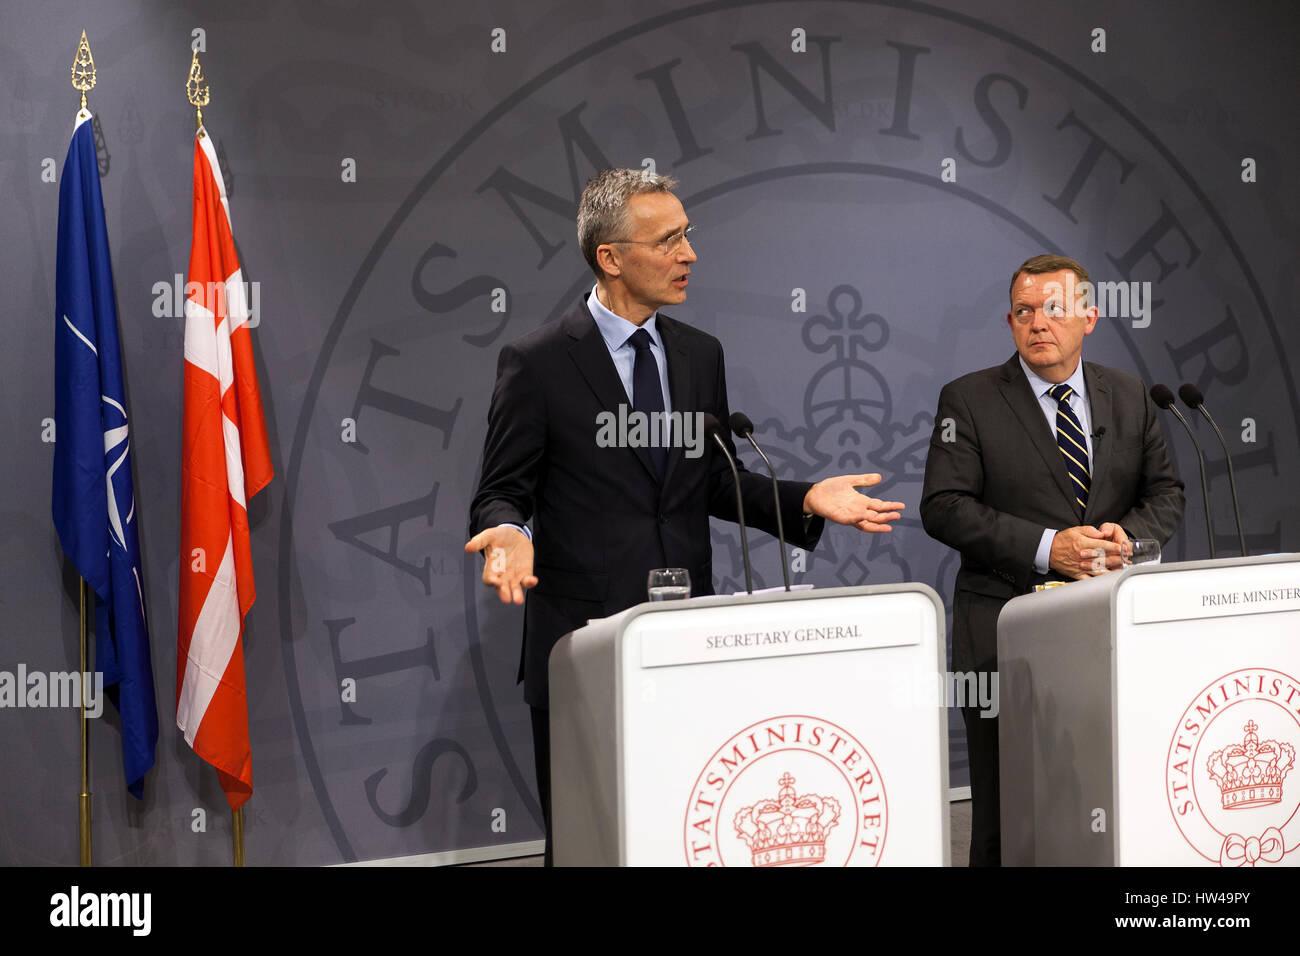 NATO Secretary General Jens Stoltenberg (L) speaks at a press conference with Danish Prime Minister Lars Lokke Rasmussen - Stock Image